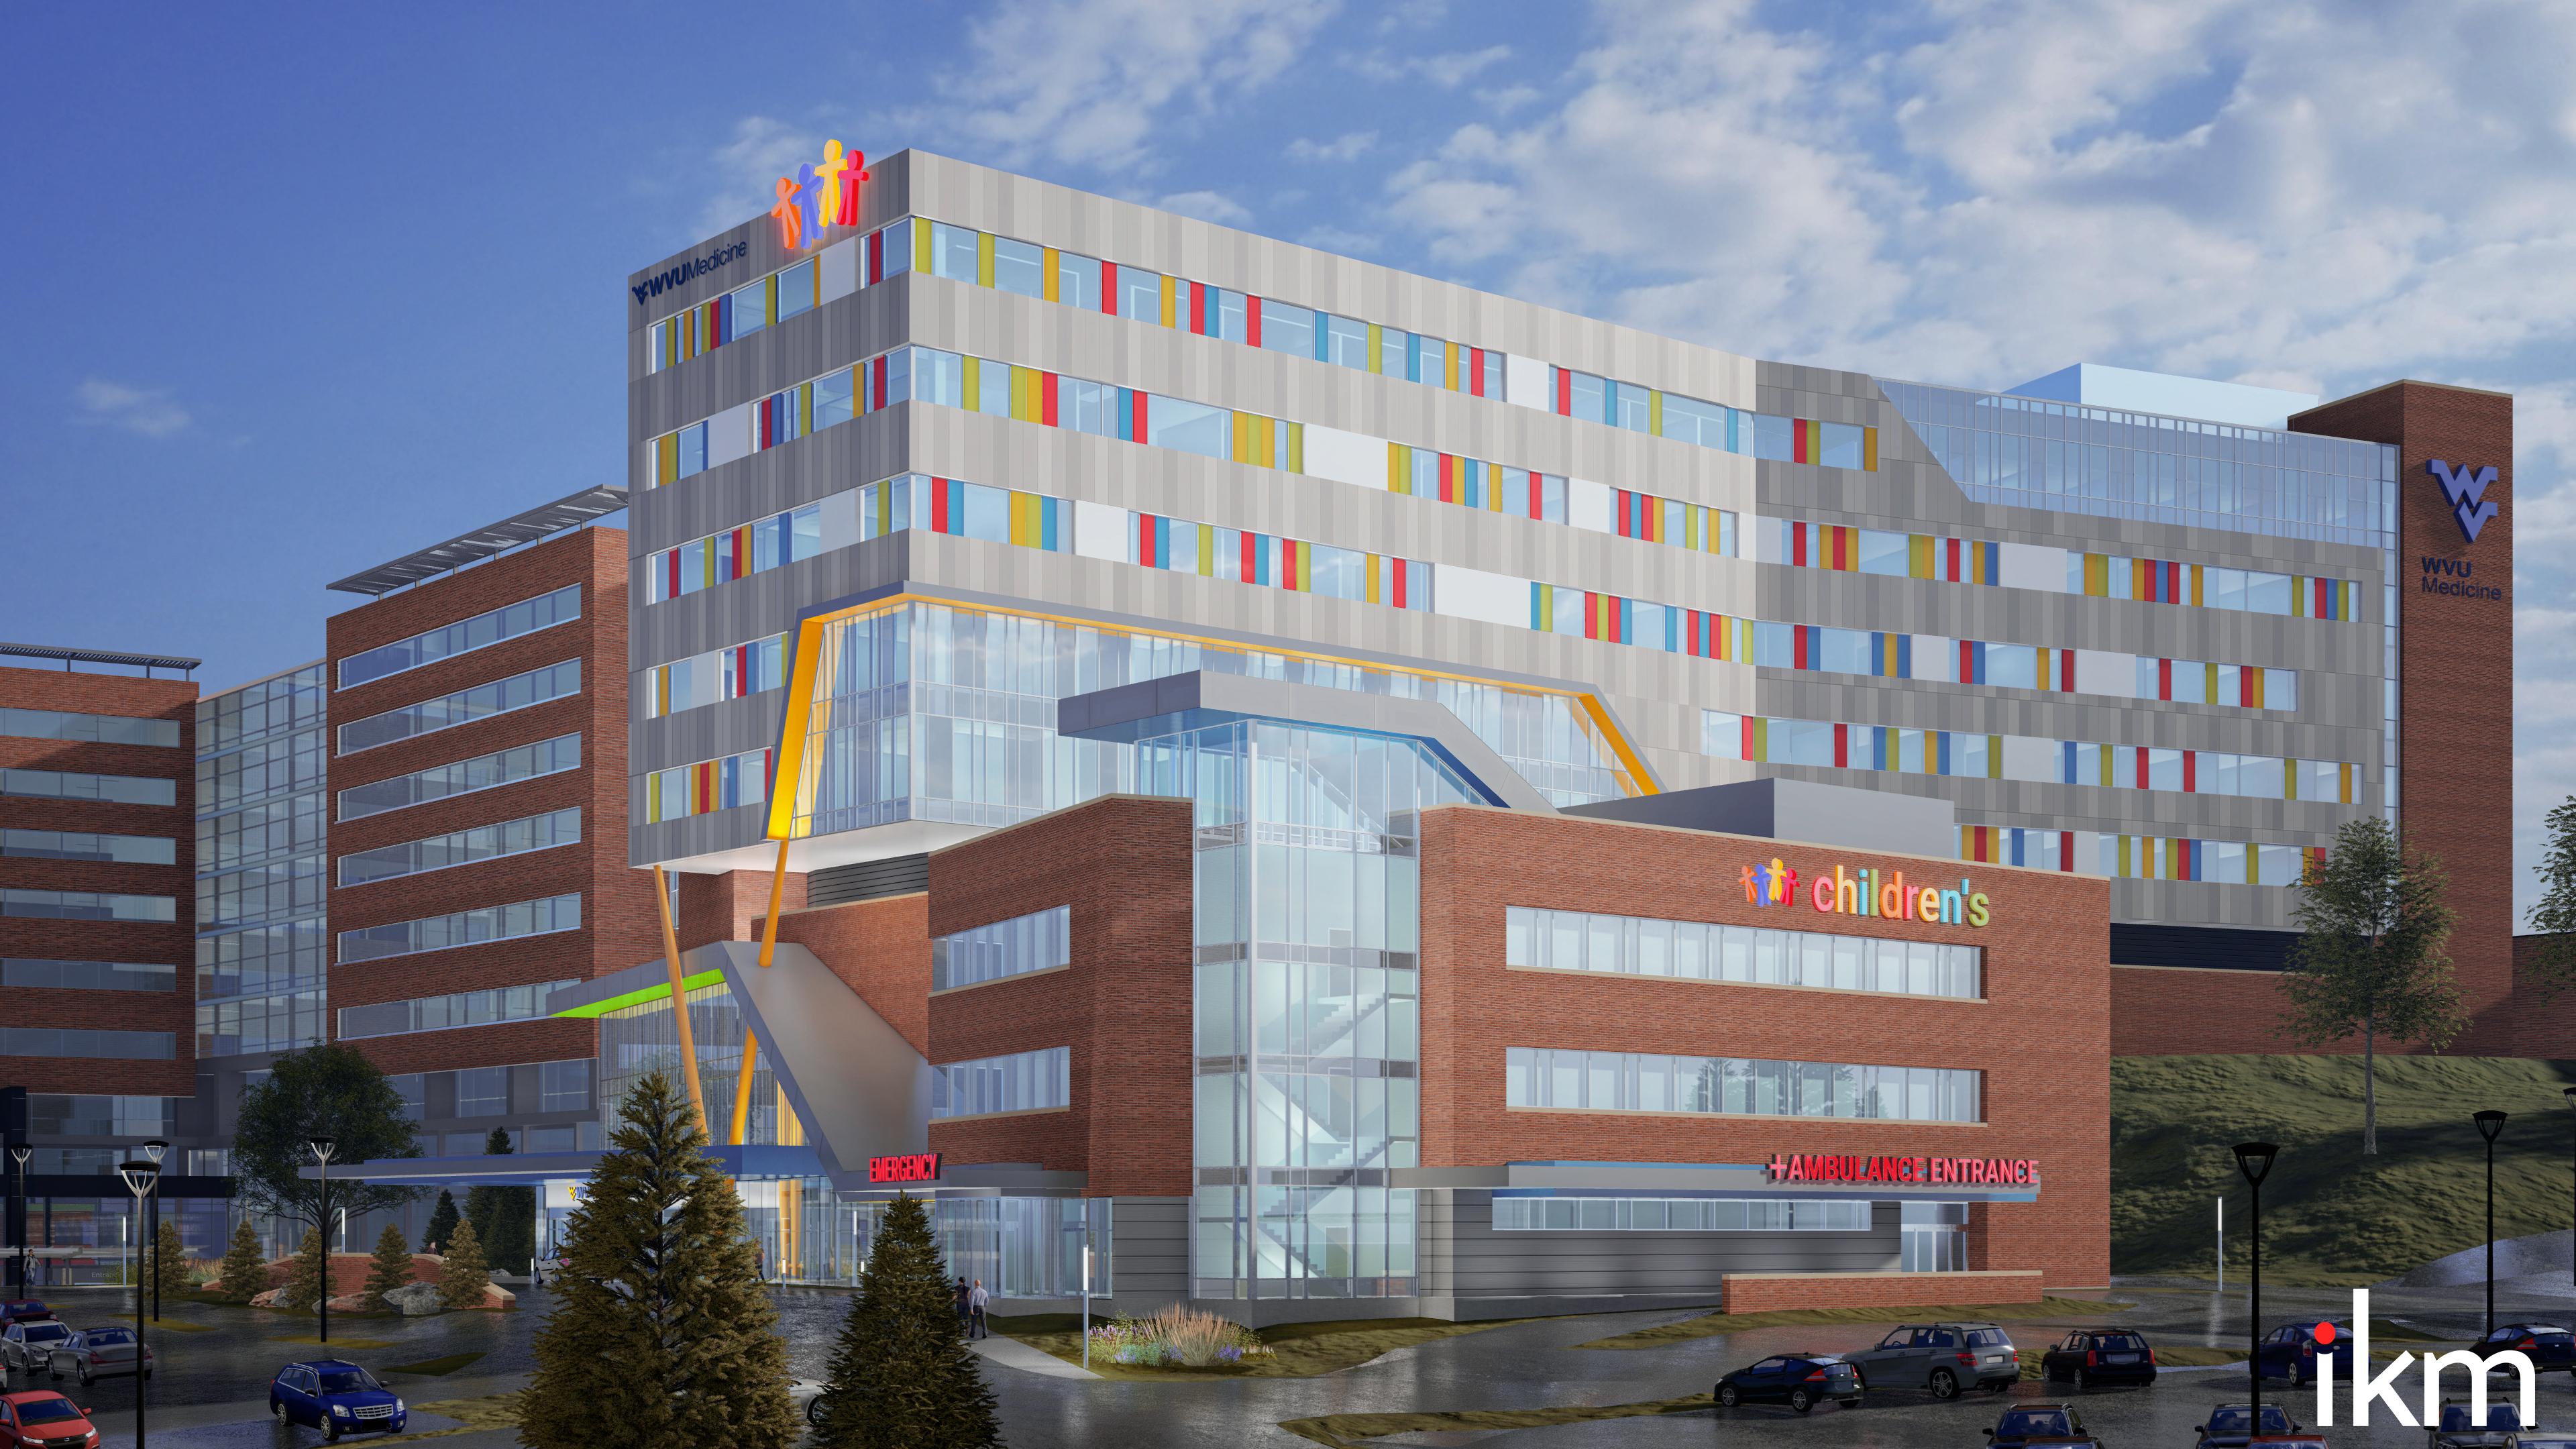 An artist's rendering of the new WVU Medicine Children's Hospital